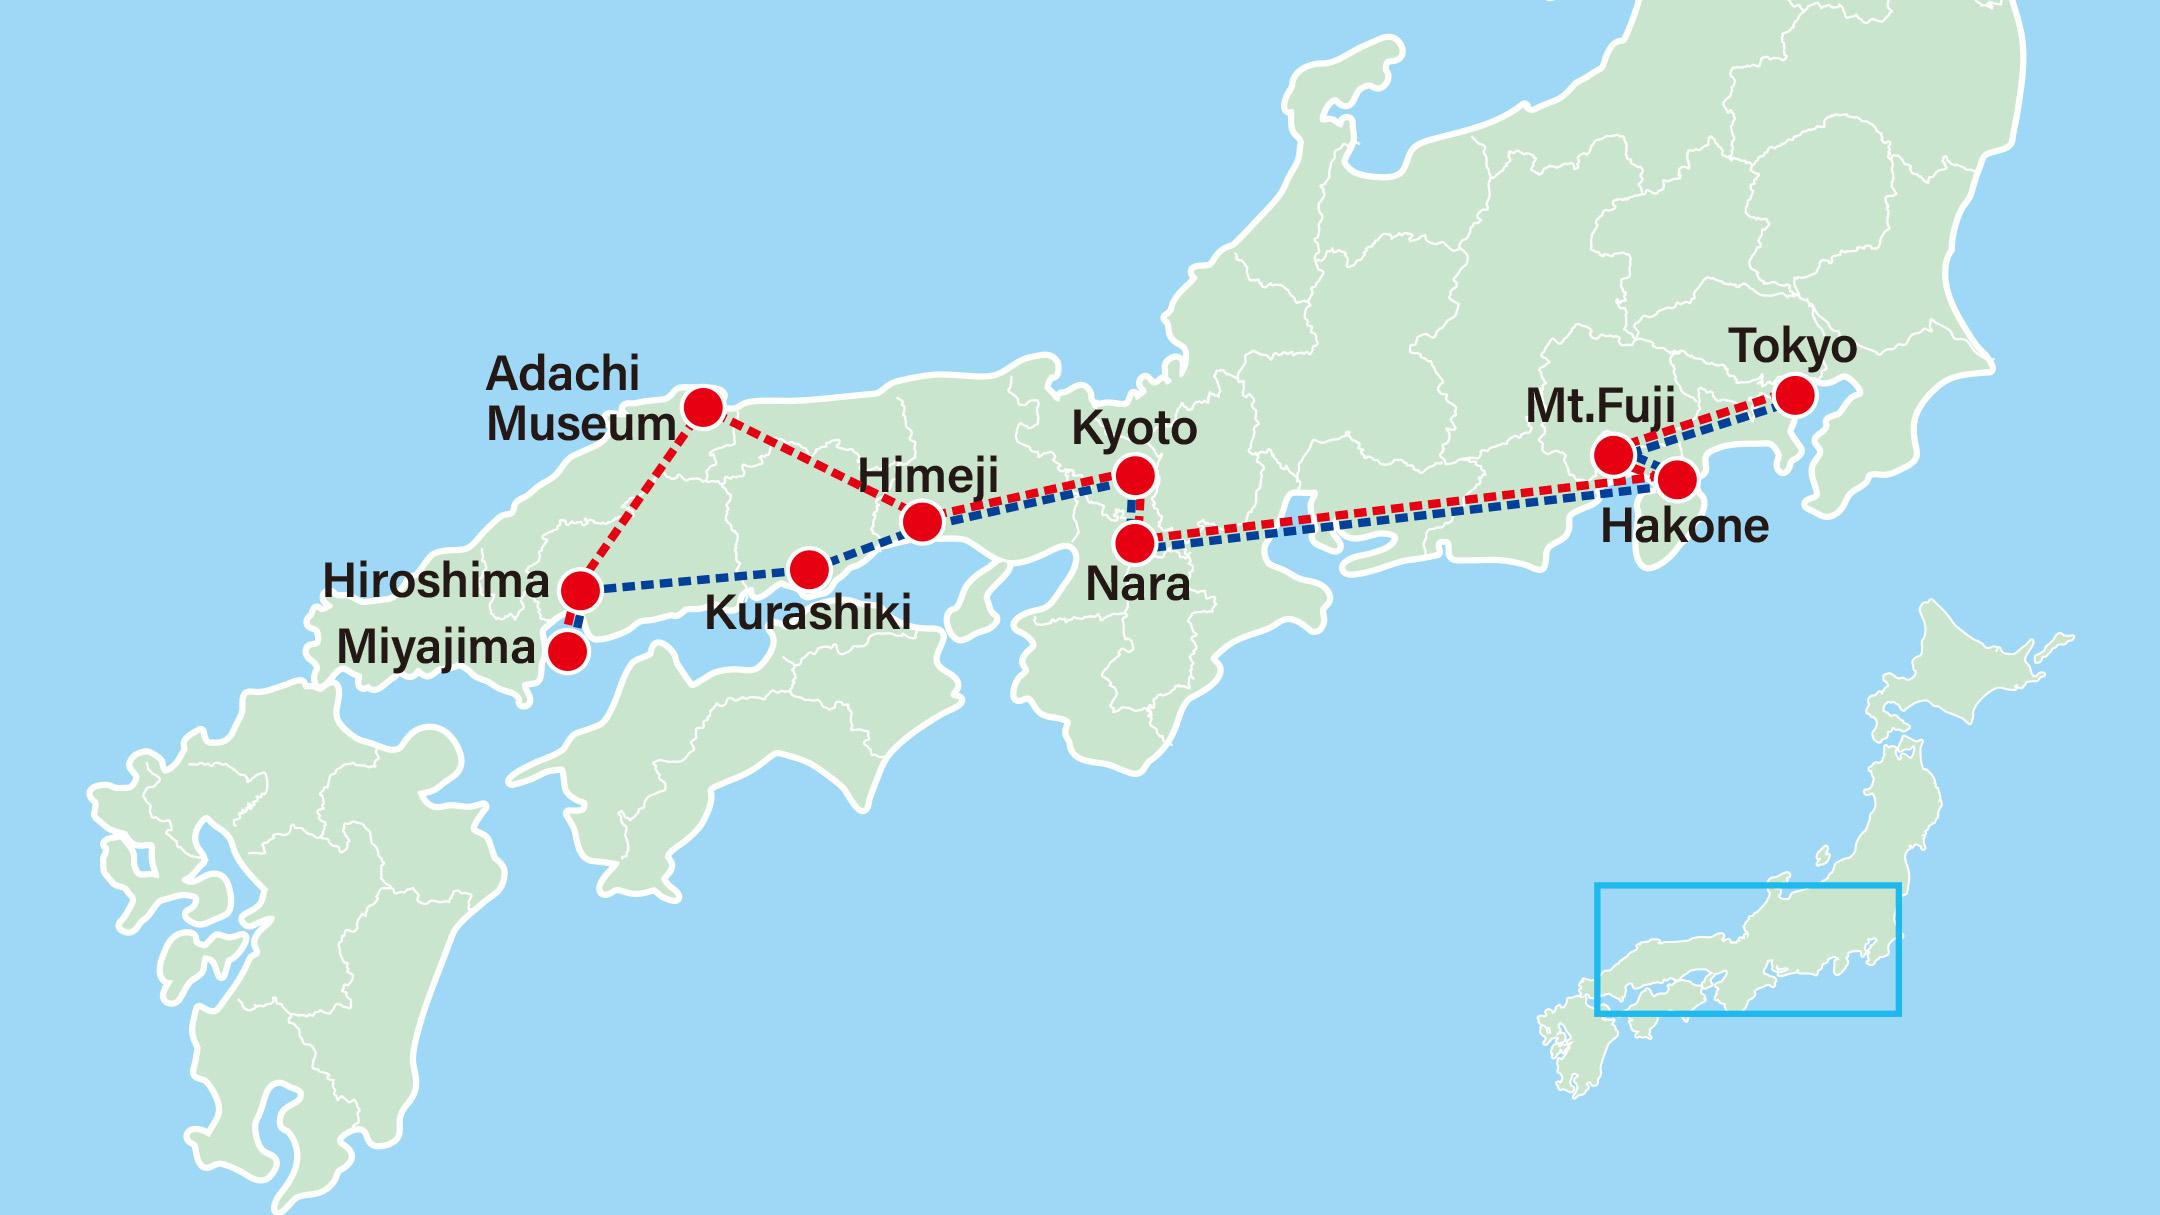 Highlights of Japan 9 Days-Tokyo-Hakone-Kyoto-Nara-Himeji-Kurashiki-Hiroshima-Miyajima